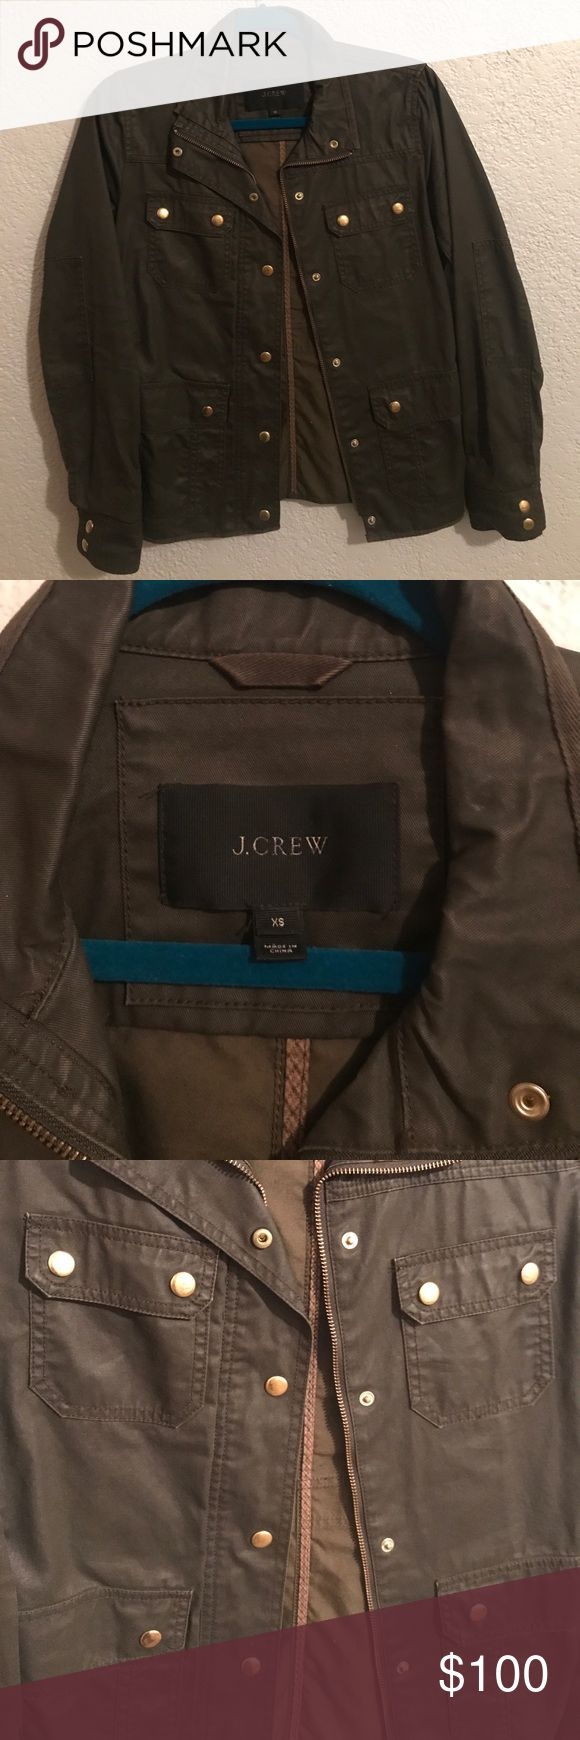 Olive green field jacket Jcrew jacket. Hardly been worn. A dark olive with gold hardware. J. Crew Jackets & Coats Utility Jackets